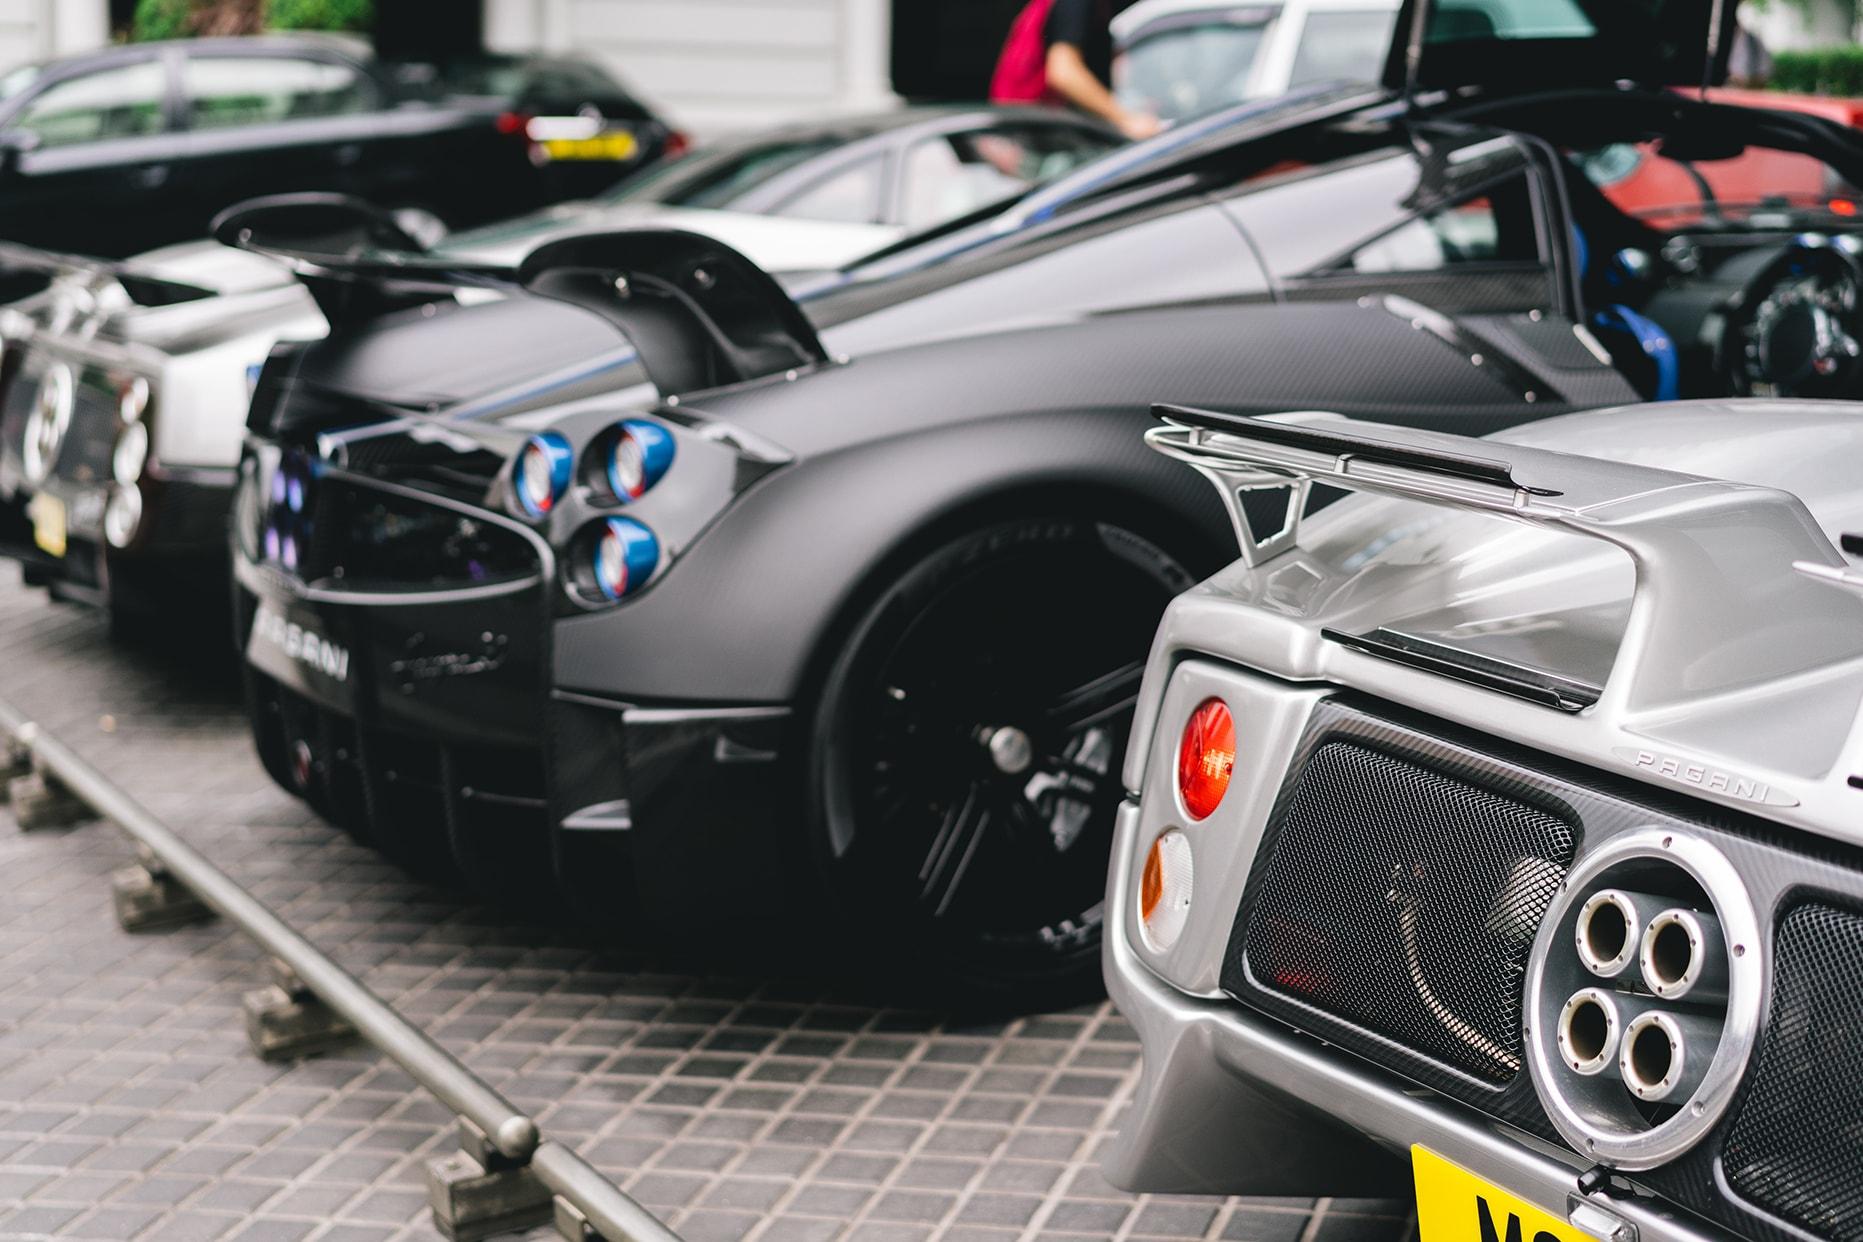 A Conversation with Horacio Pagani Zonda Huayra Hypercar Sportscar Supercar Super car racing Titanium Carbon Fiber Sports Expensive Luxury Hong Kong exhaust music fancy Music Tech Electric Motor Horsepower